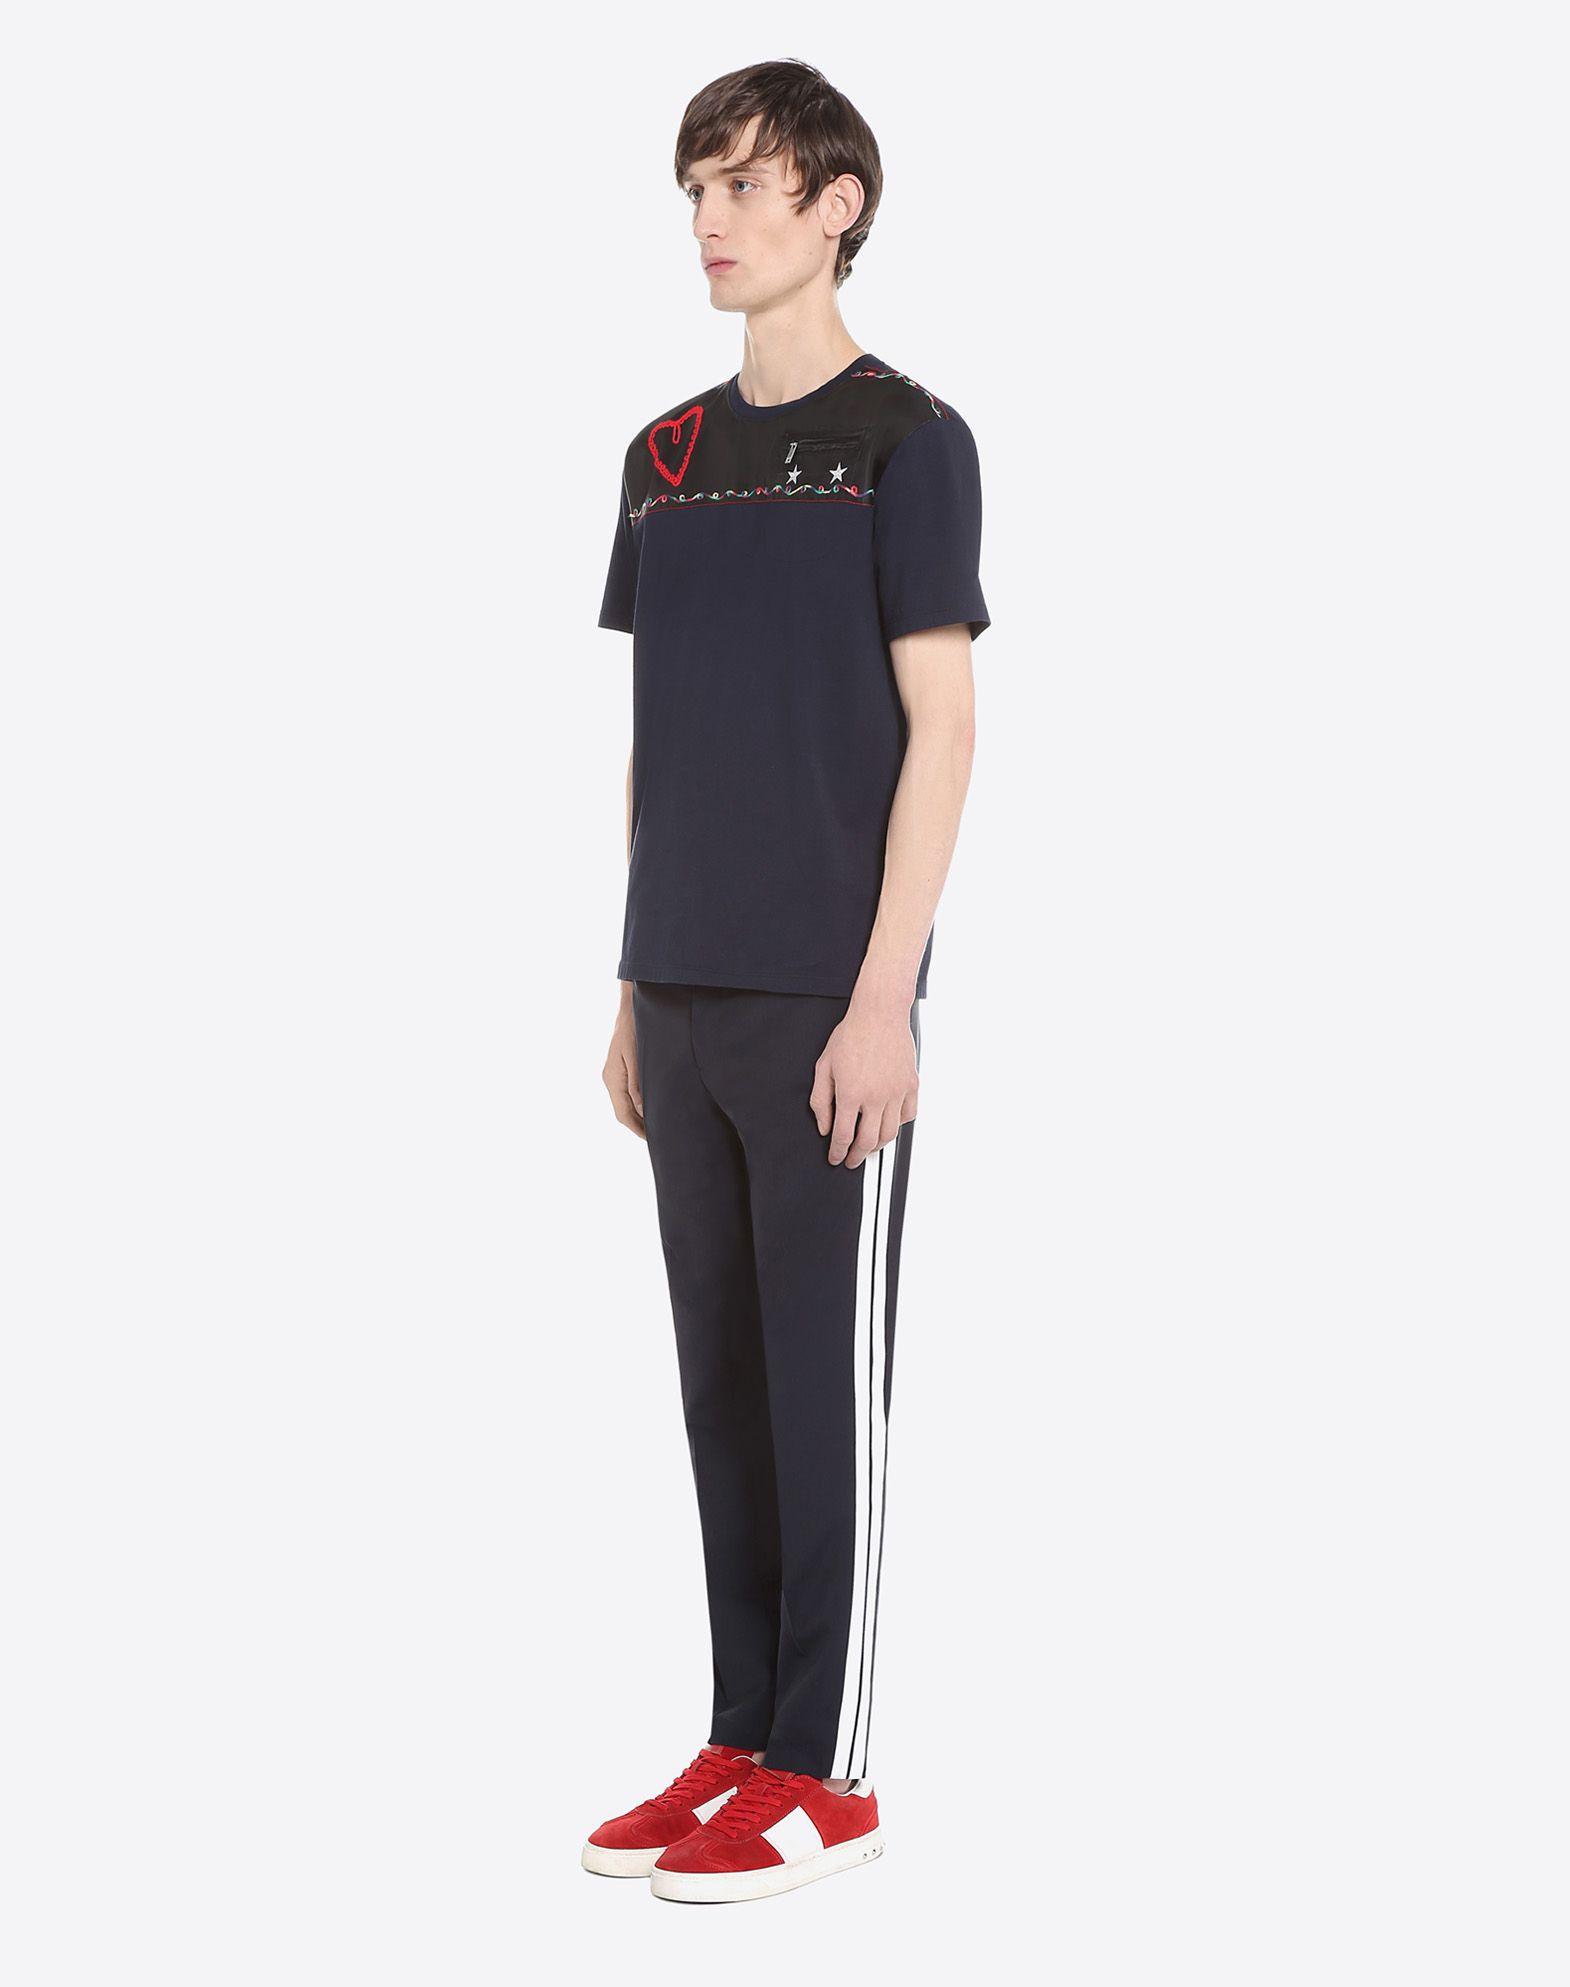 VALENTINO Solid colour Round collar  12032285kh